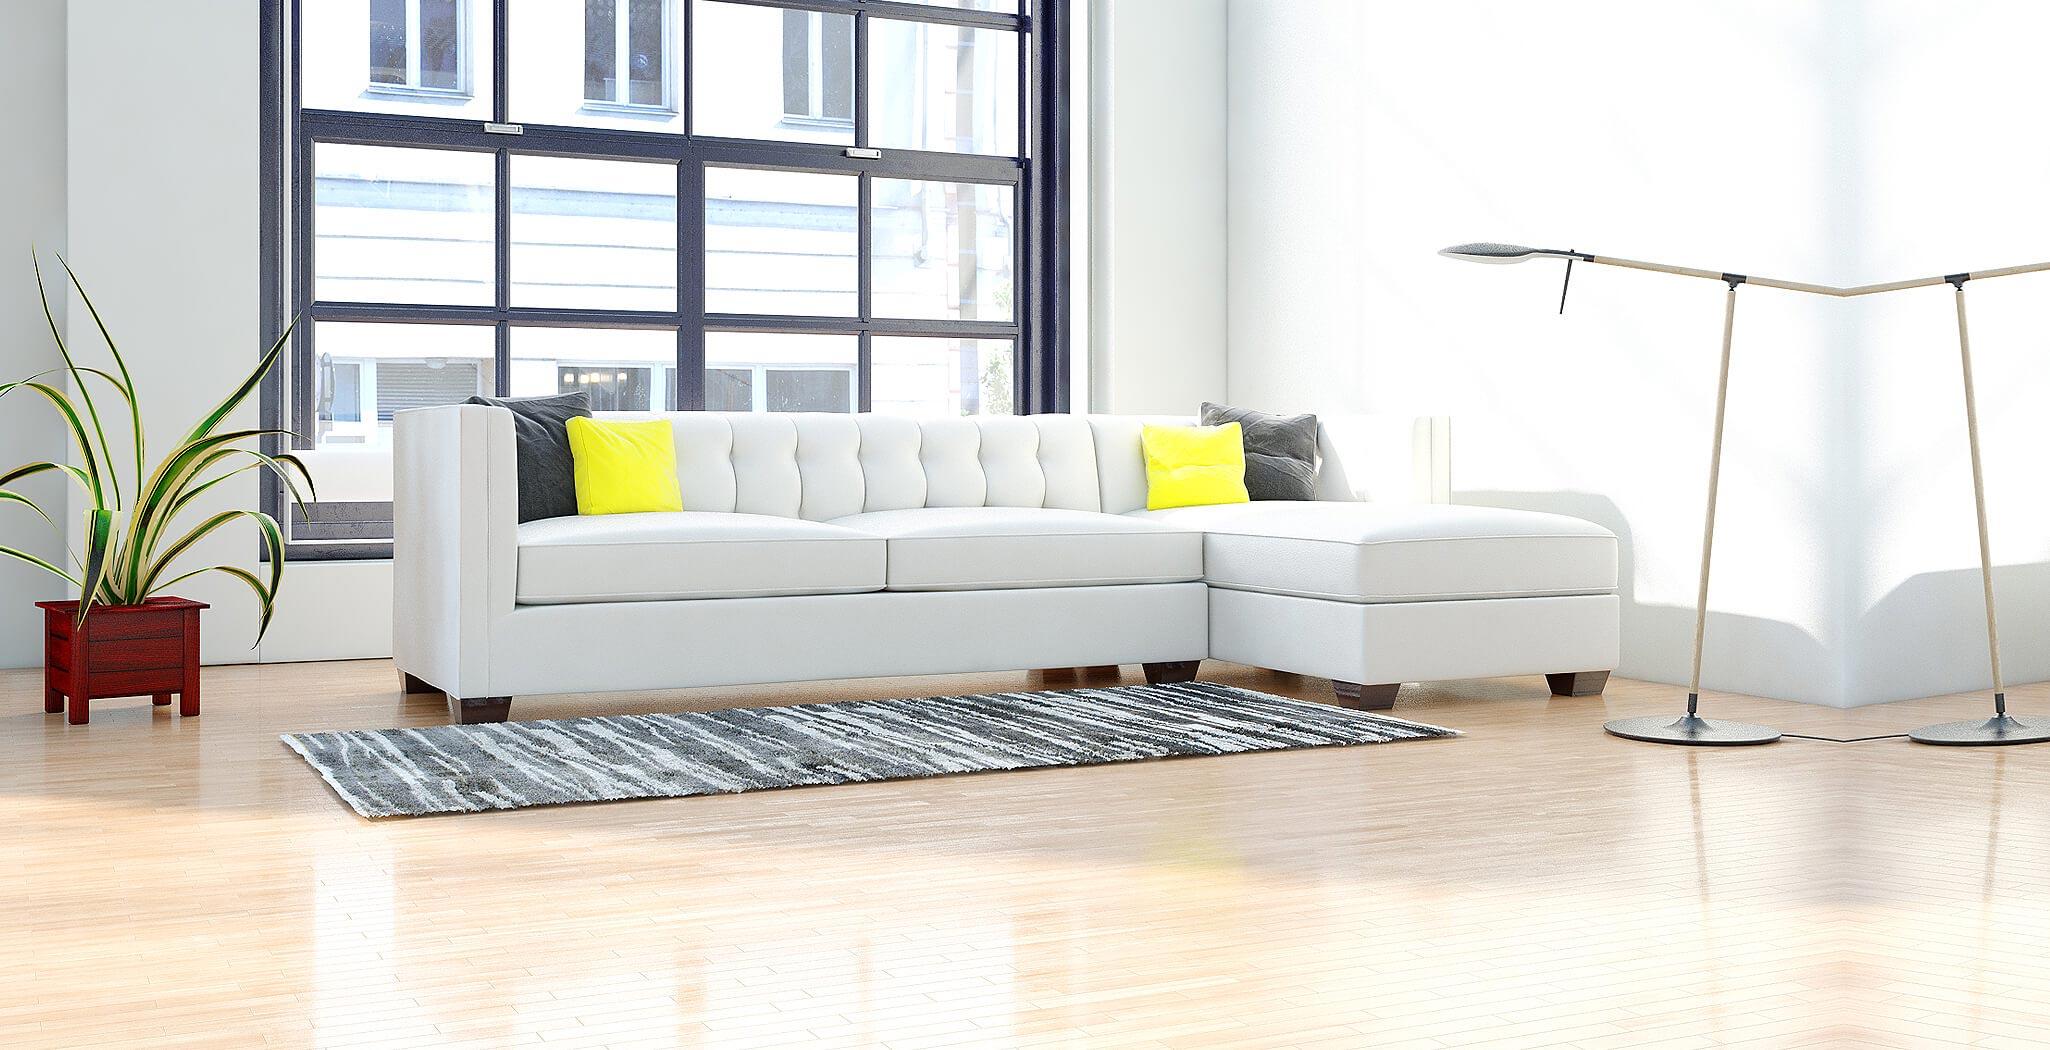 grant panel furniture gallery 2